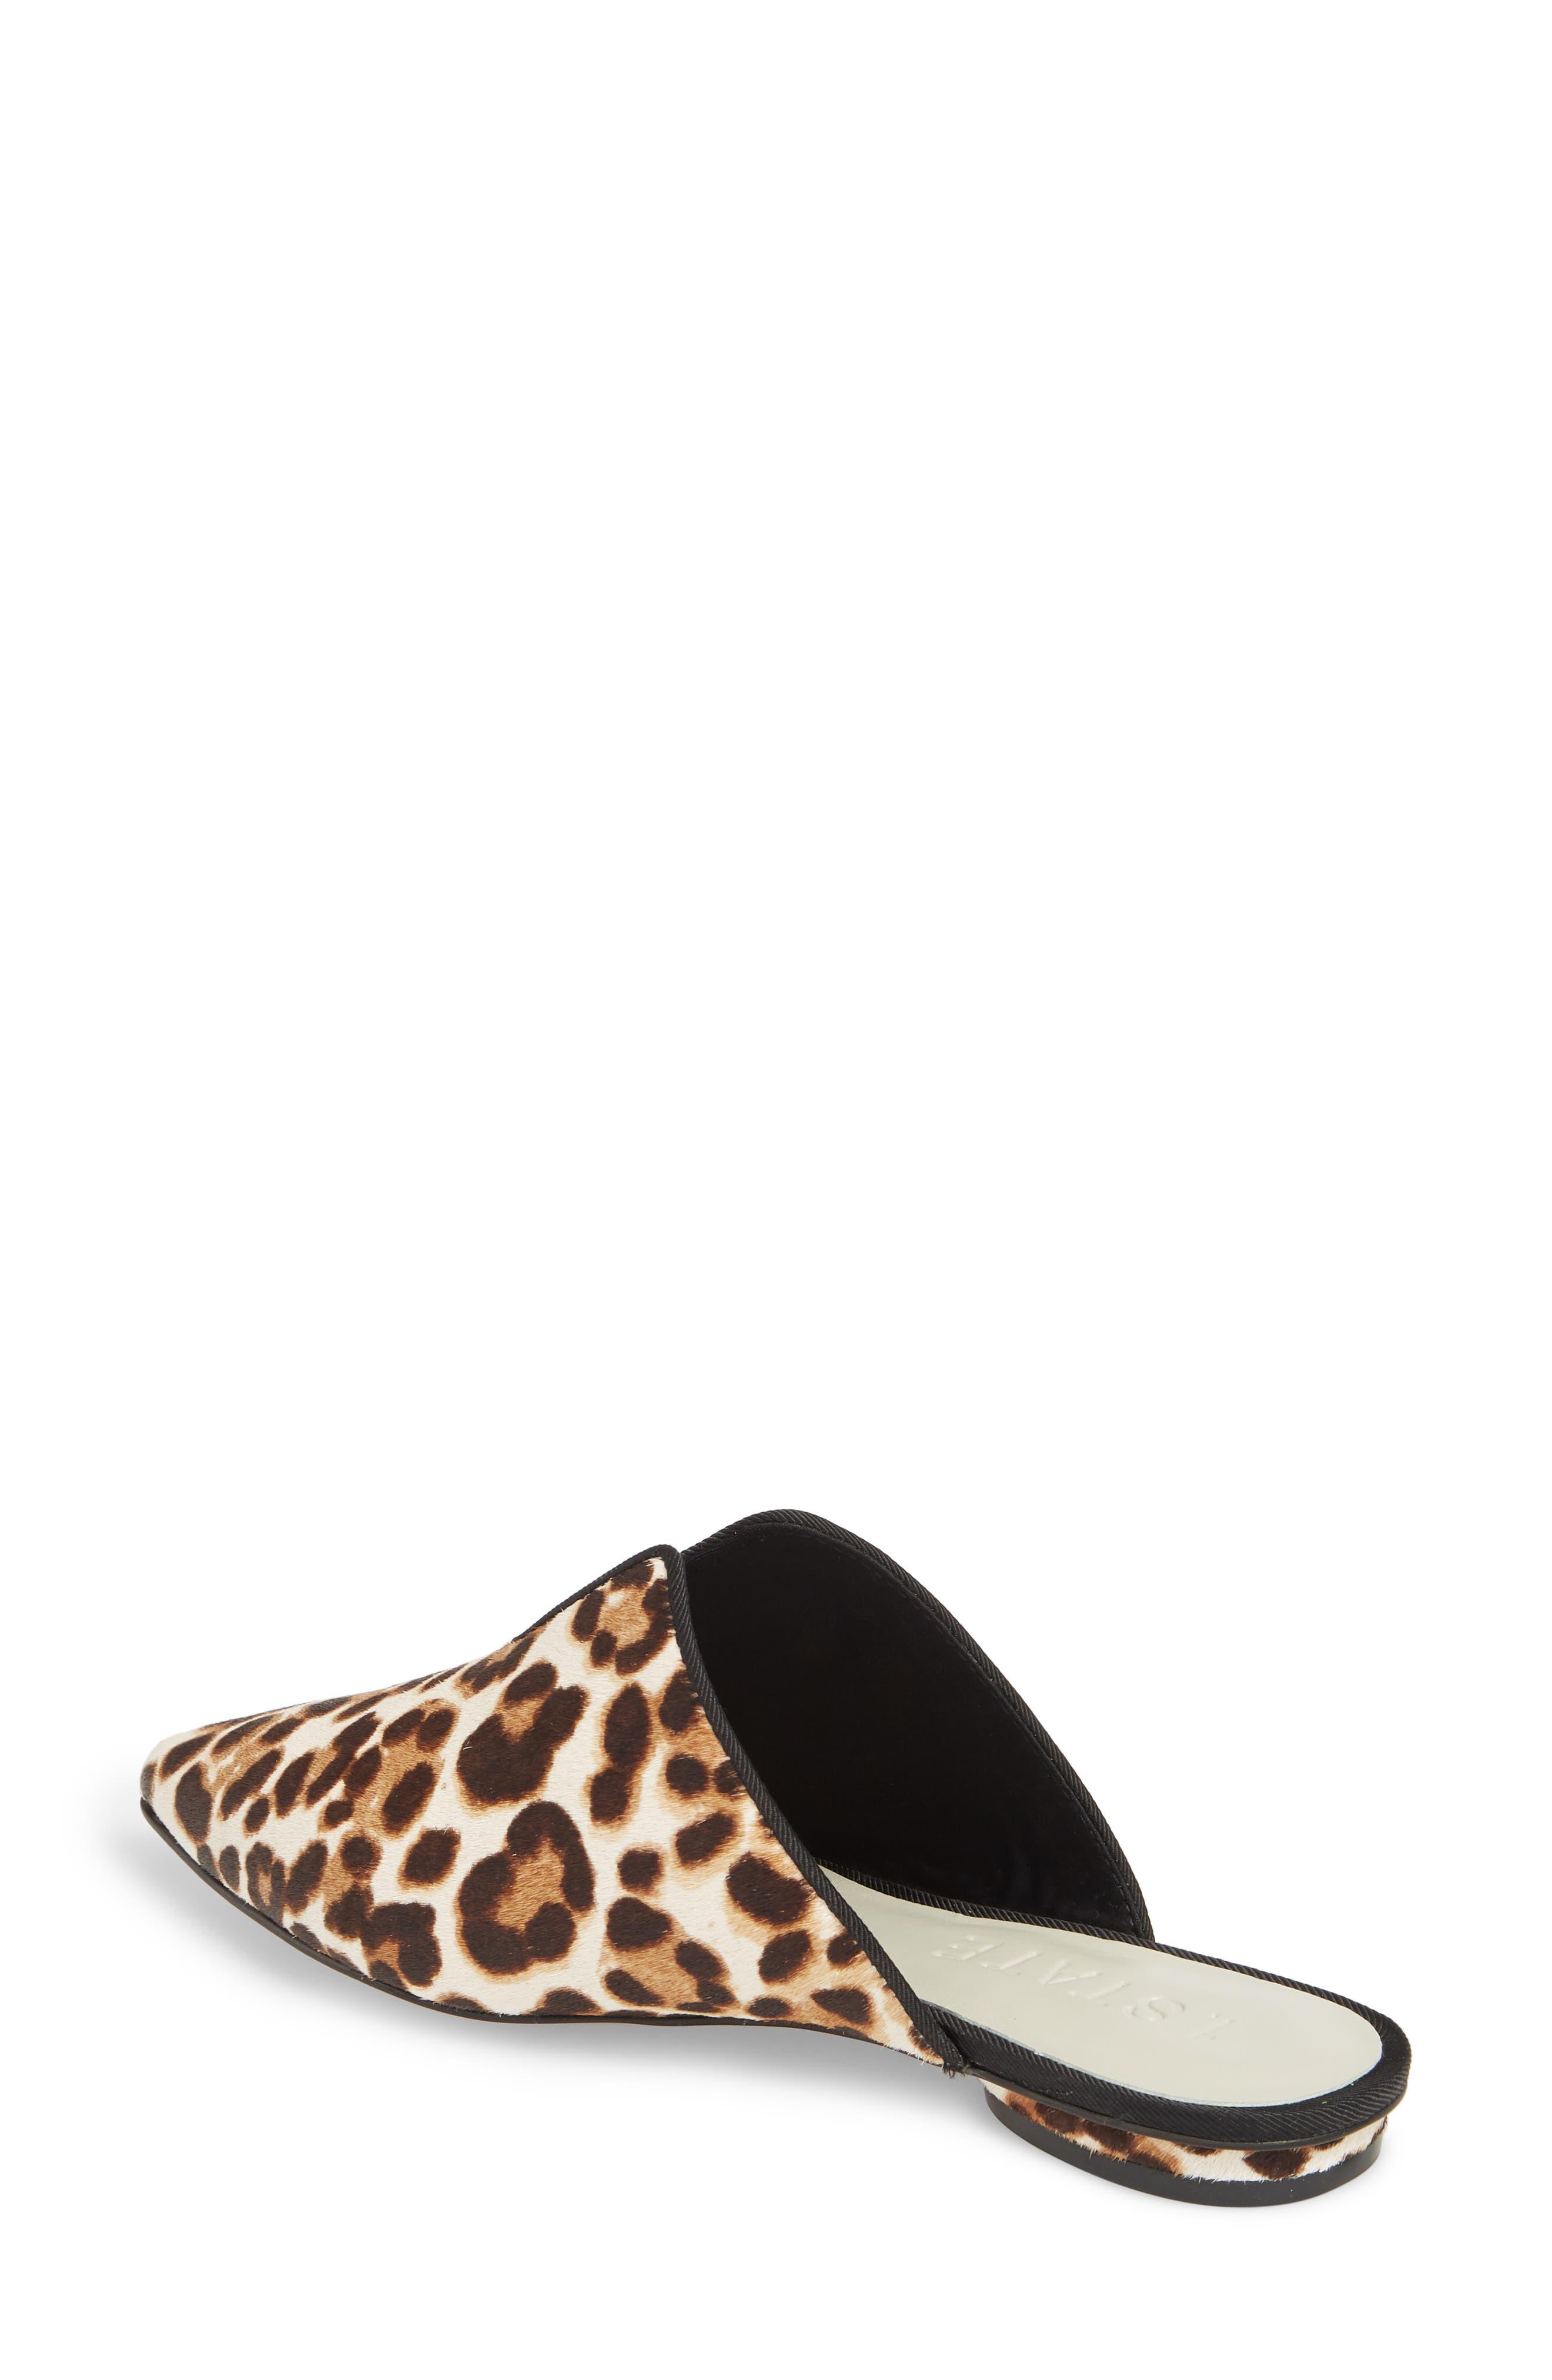 Genia Genuine Calf Hair Mule,                             Alternate thumbnail 2, color,                             Cheetah/ Black Calf Hair